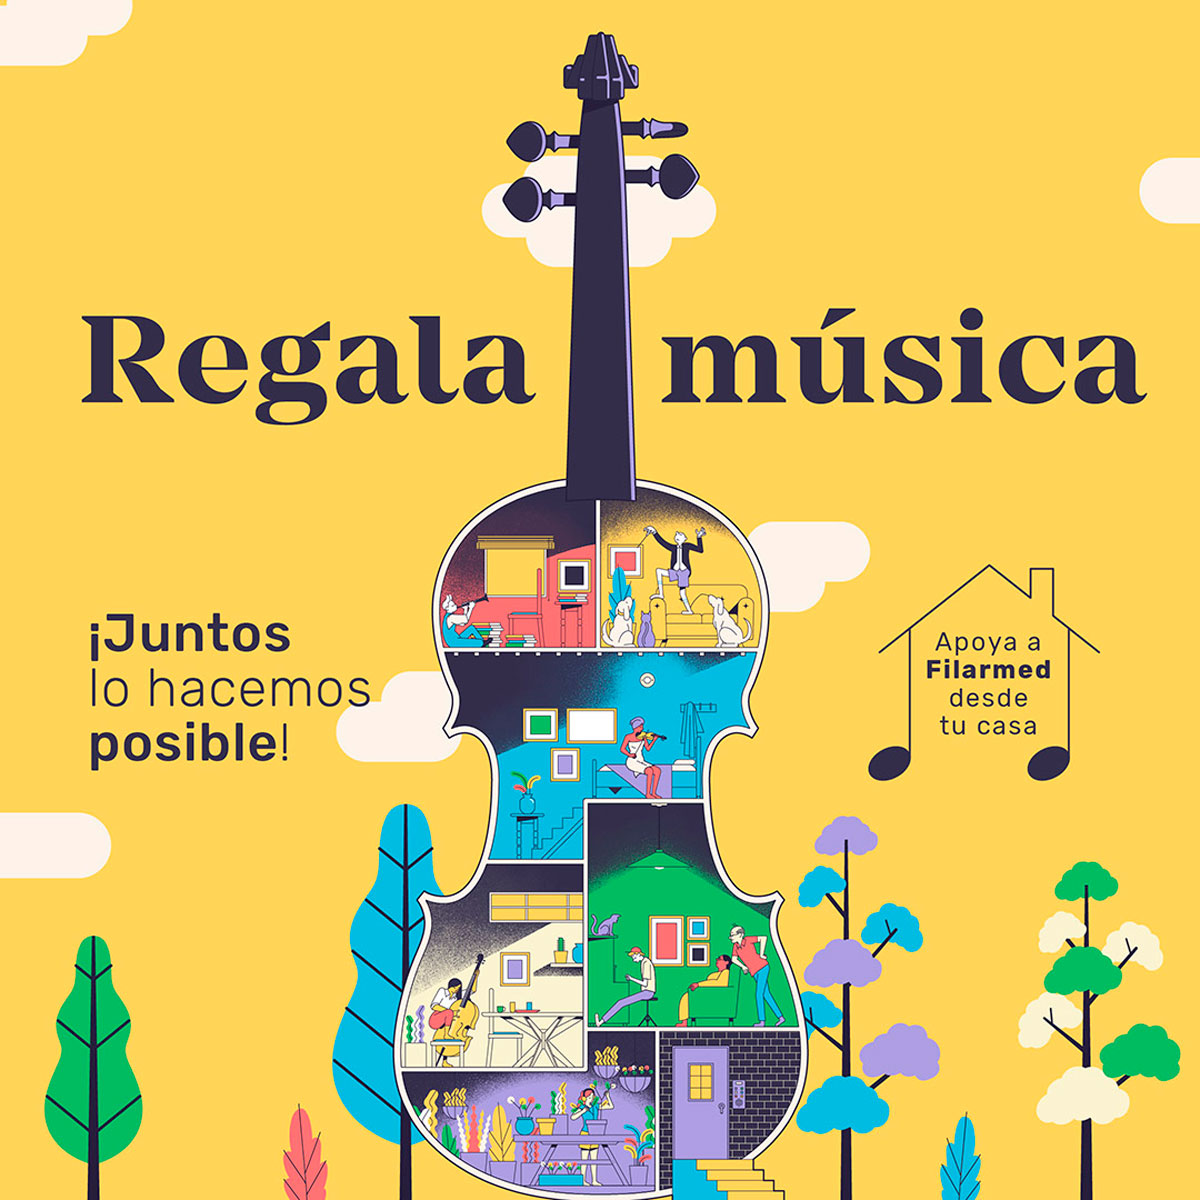 Orquesta Filarmónica de Medellín